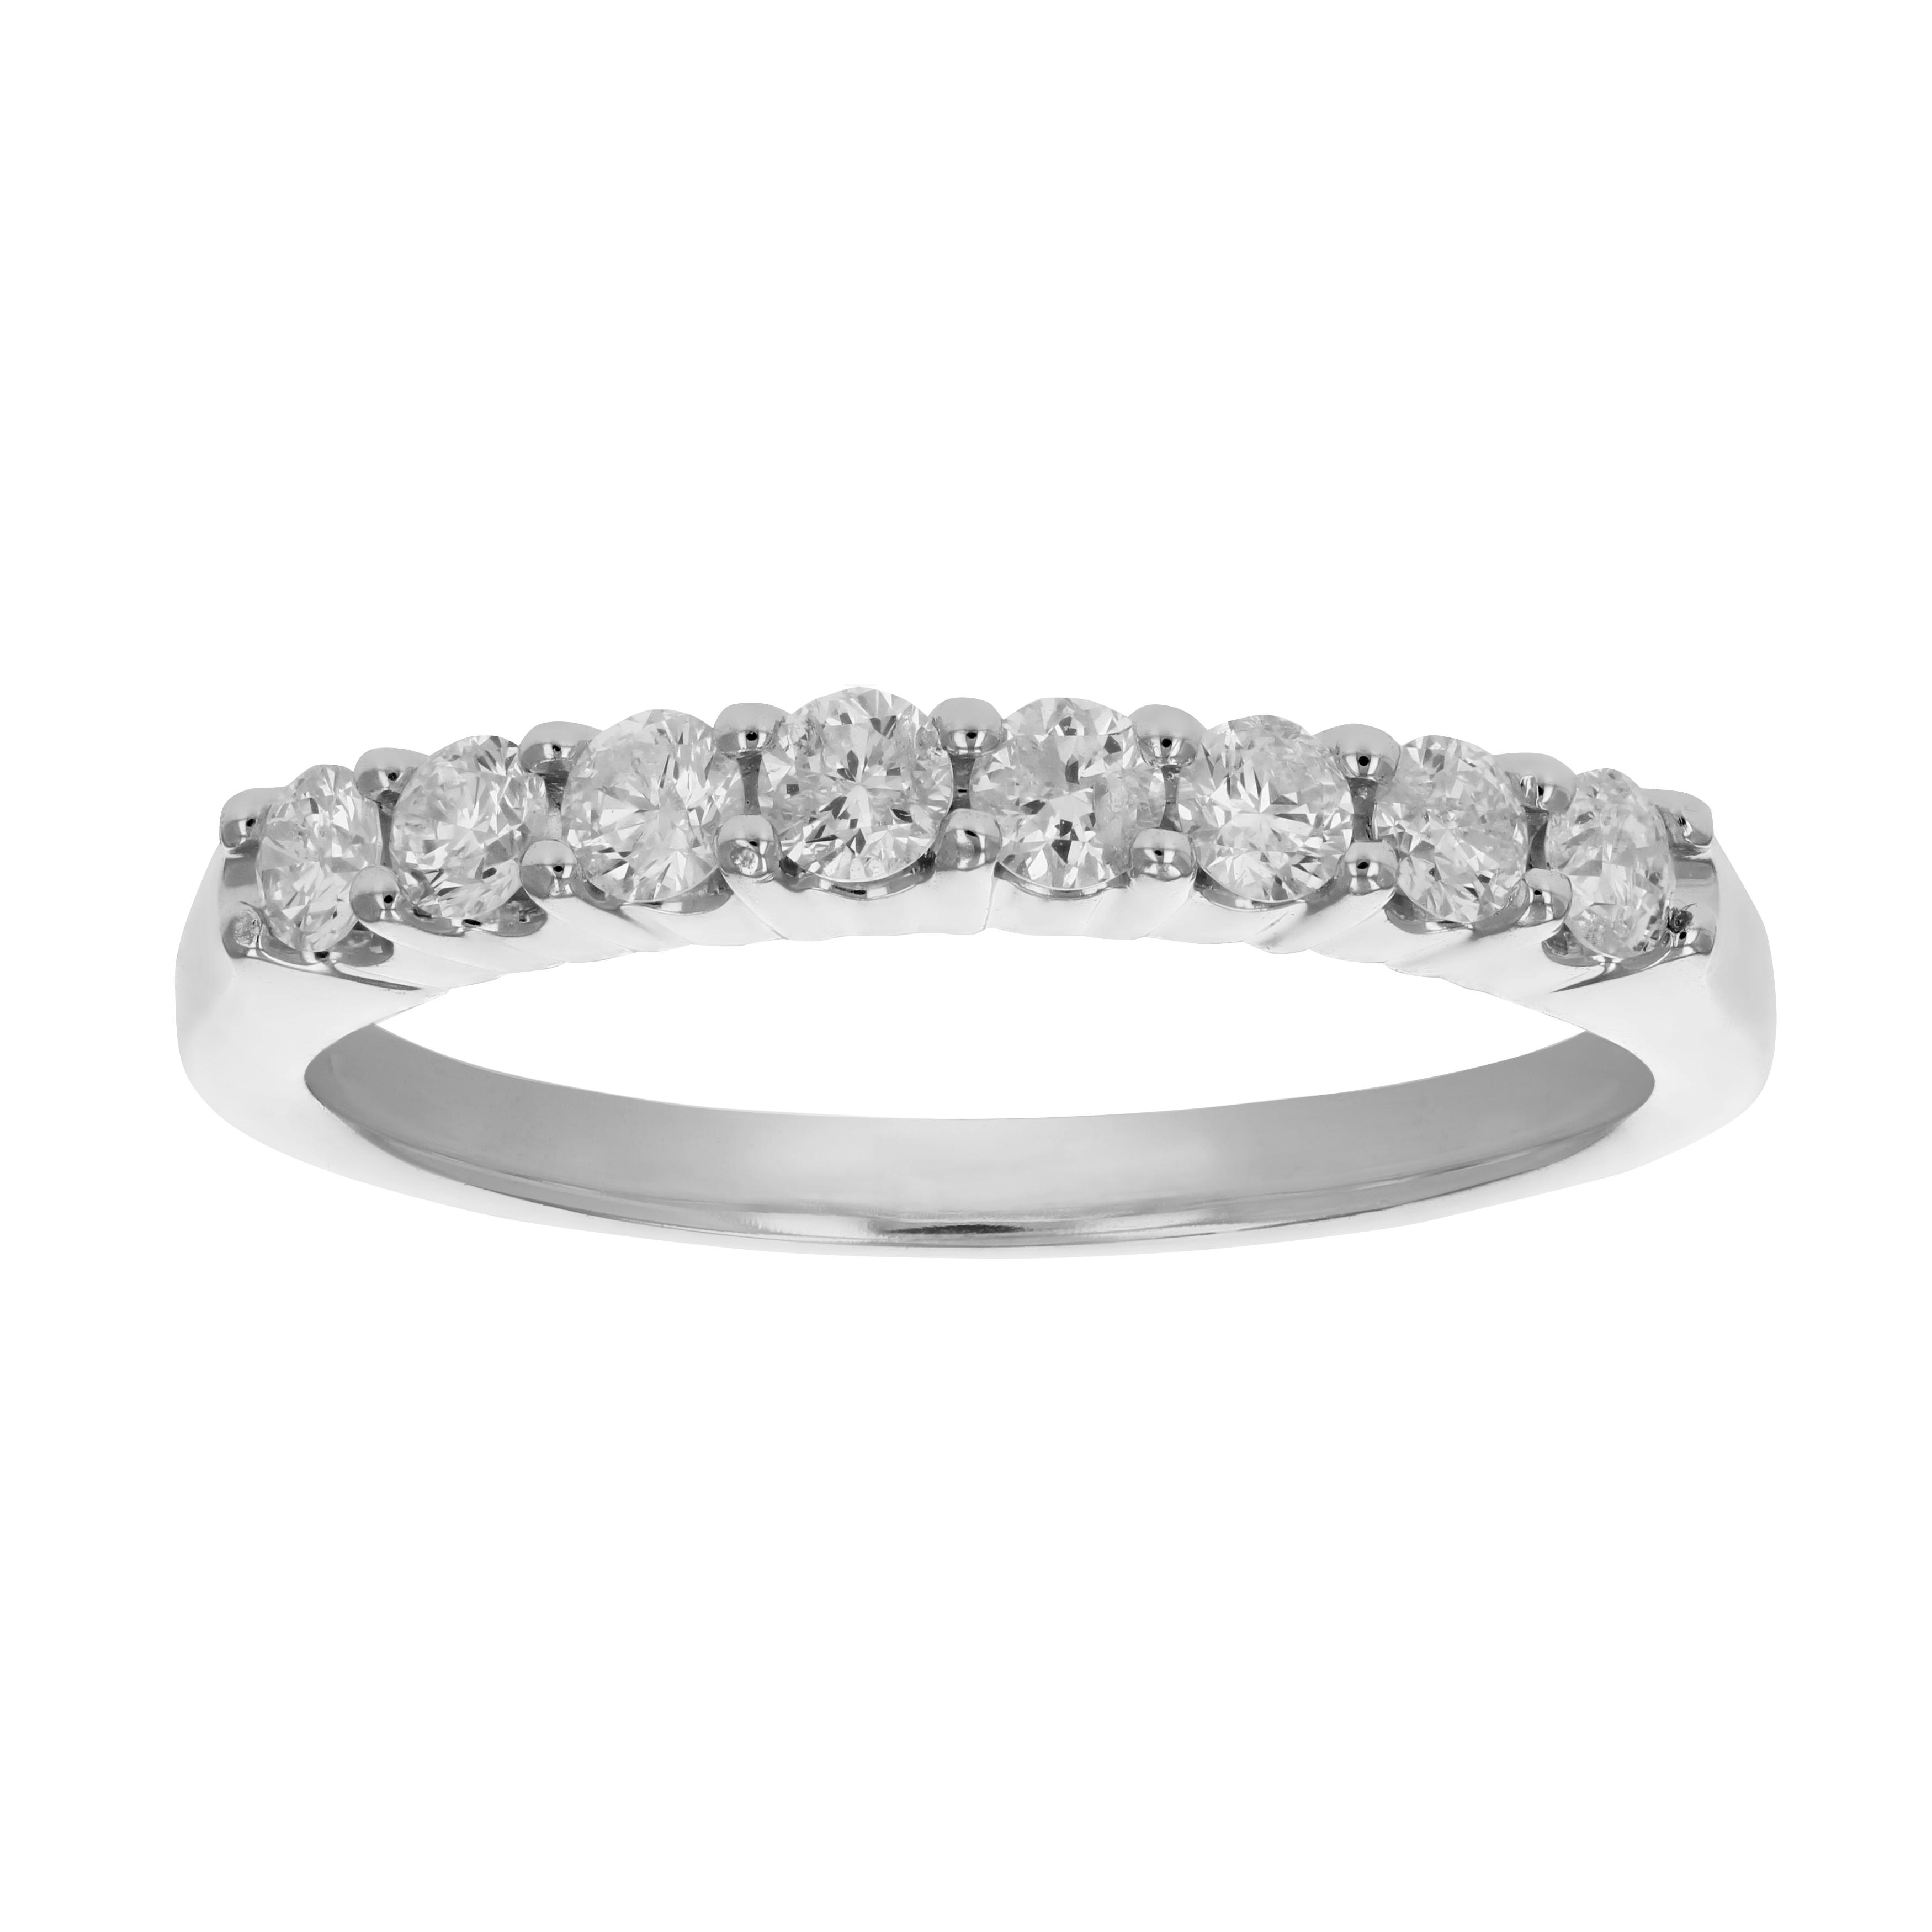 83fba5af2ac16 Details about 1/2 cttw Certified I1-I2 Diamond Wedding Band Prong Set in  14K Gold